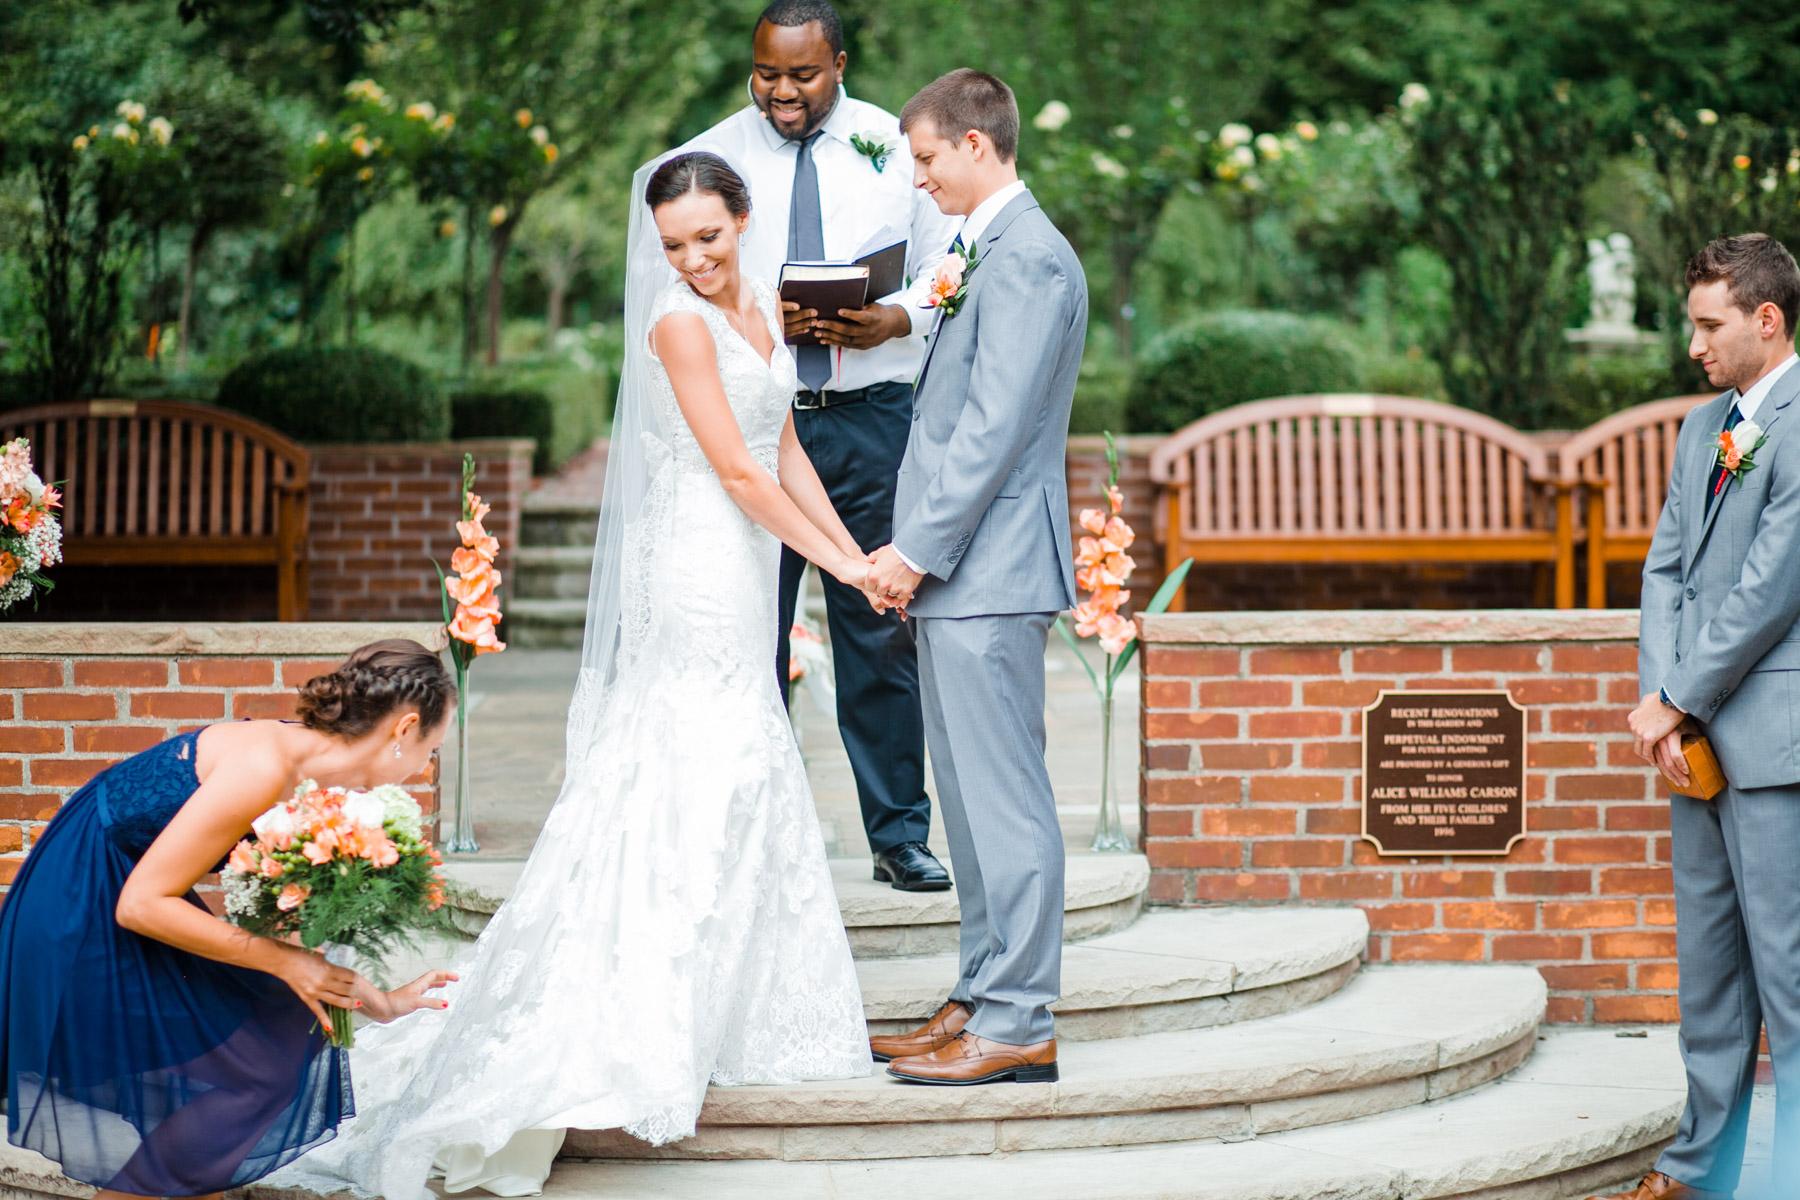 wildwood-park-wedding-photos-47.jpg